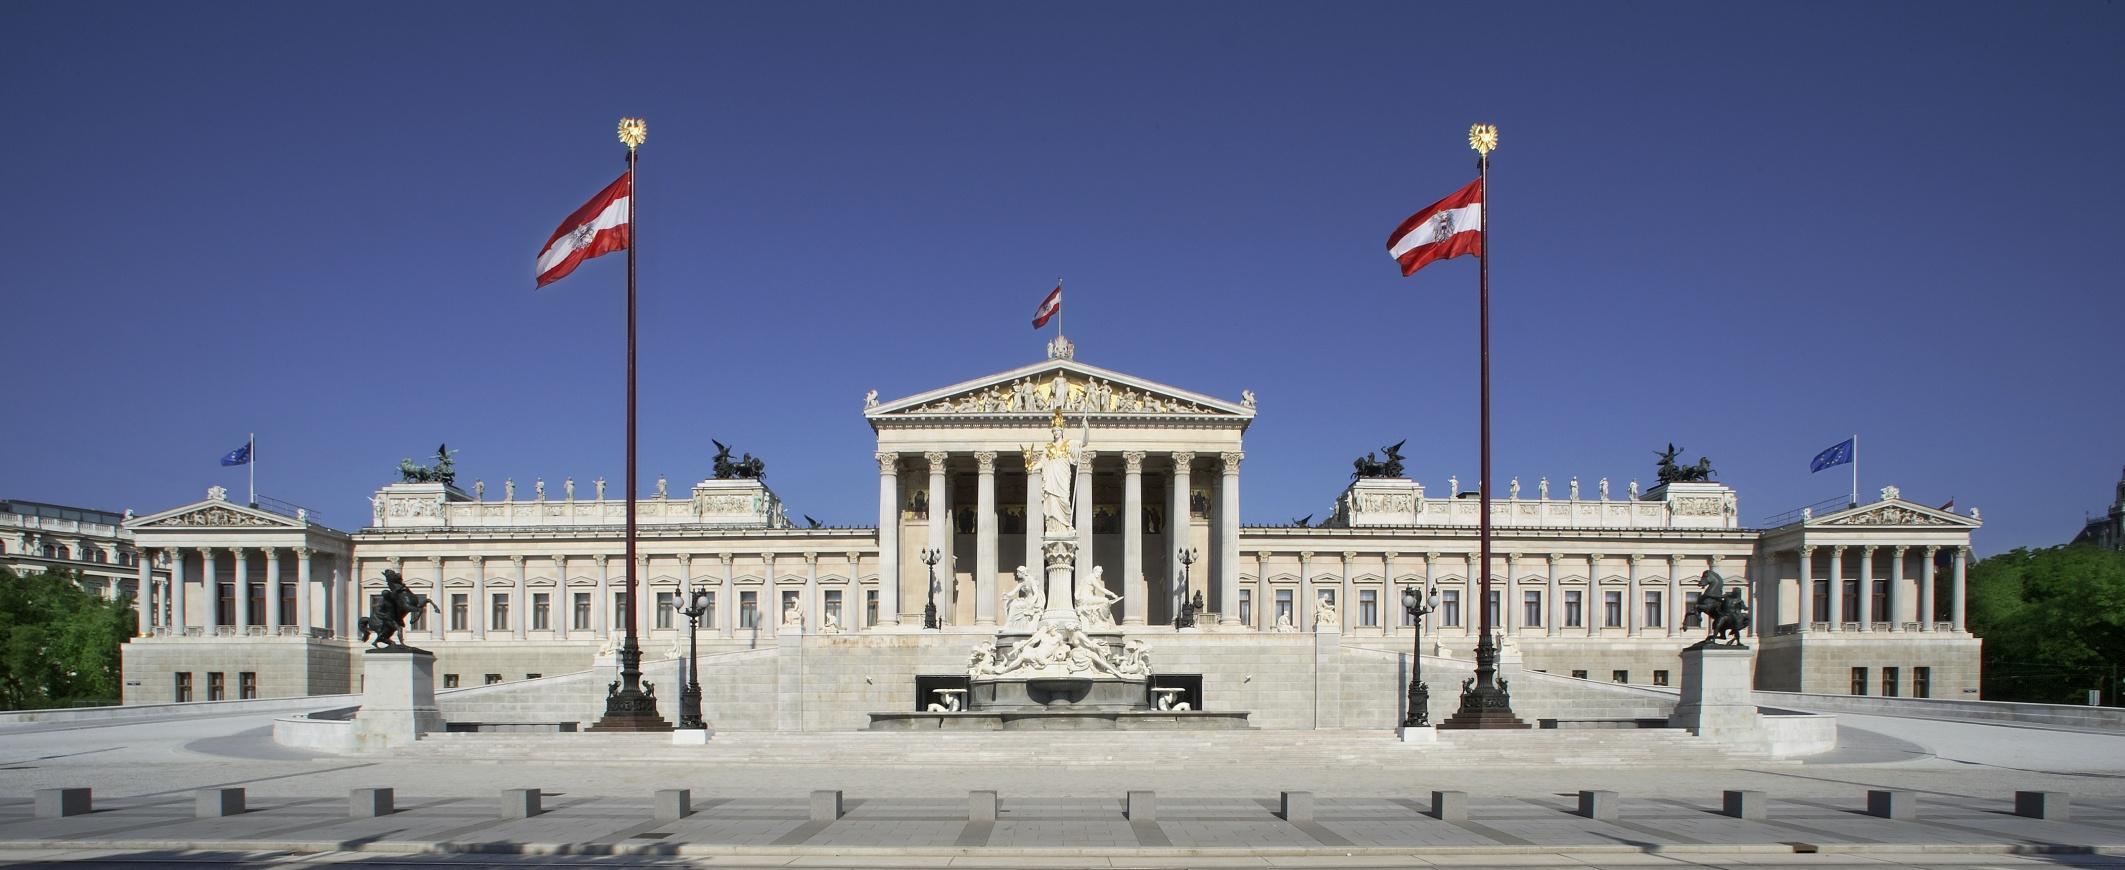 Austrian Parliament (c)Parlamentsdirektion / Peter Korrak